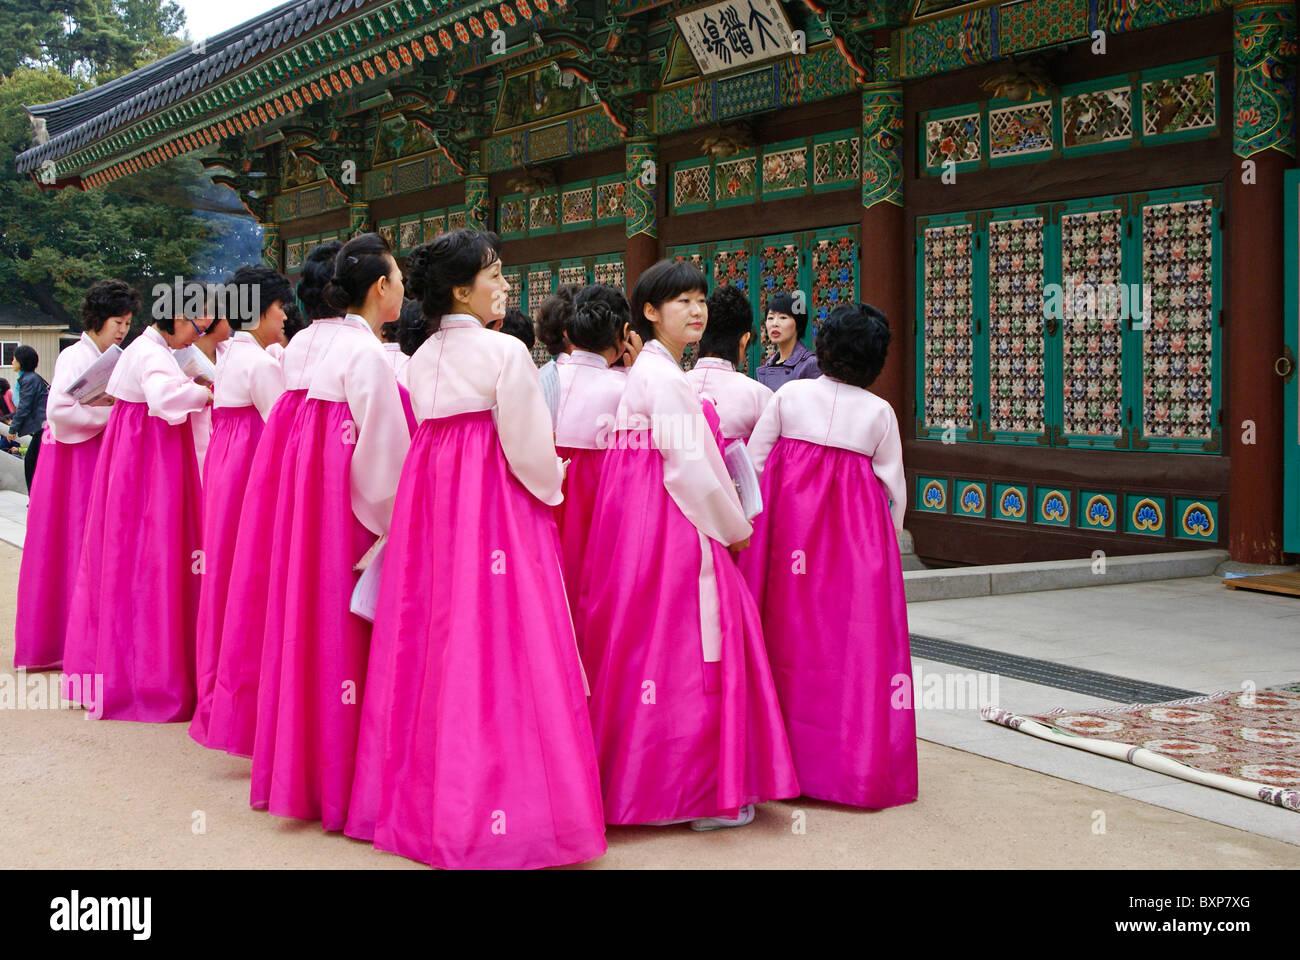 Worshippers at Bongeunsa Buddhist temple, Seoul, South Korea - Stock Image